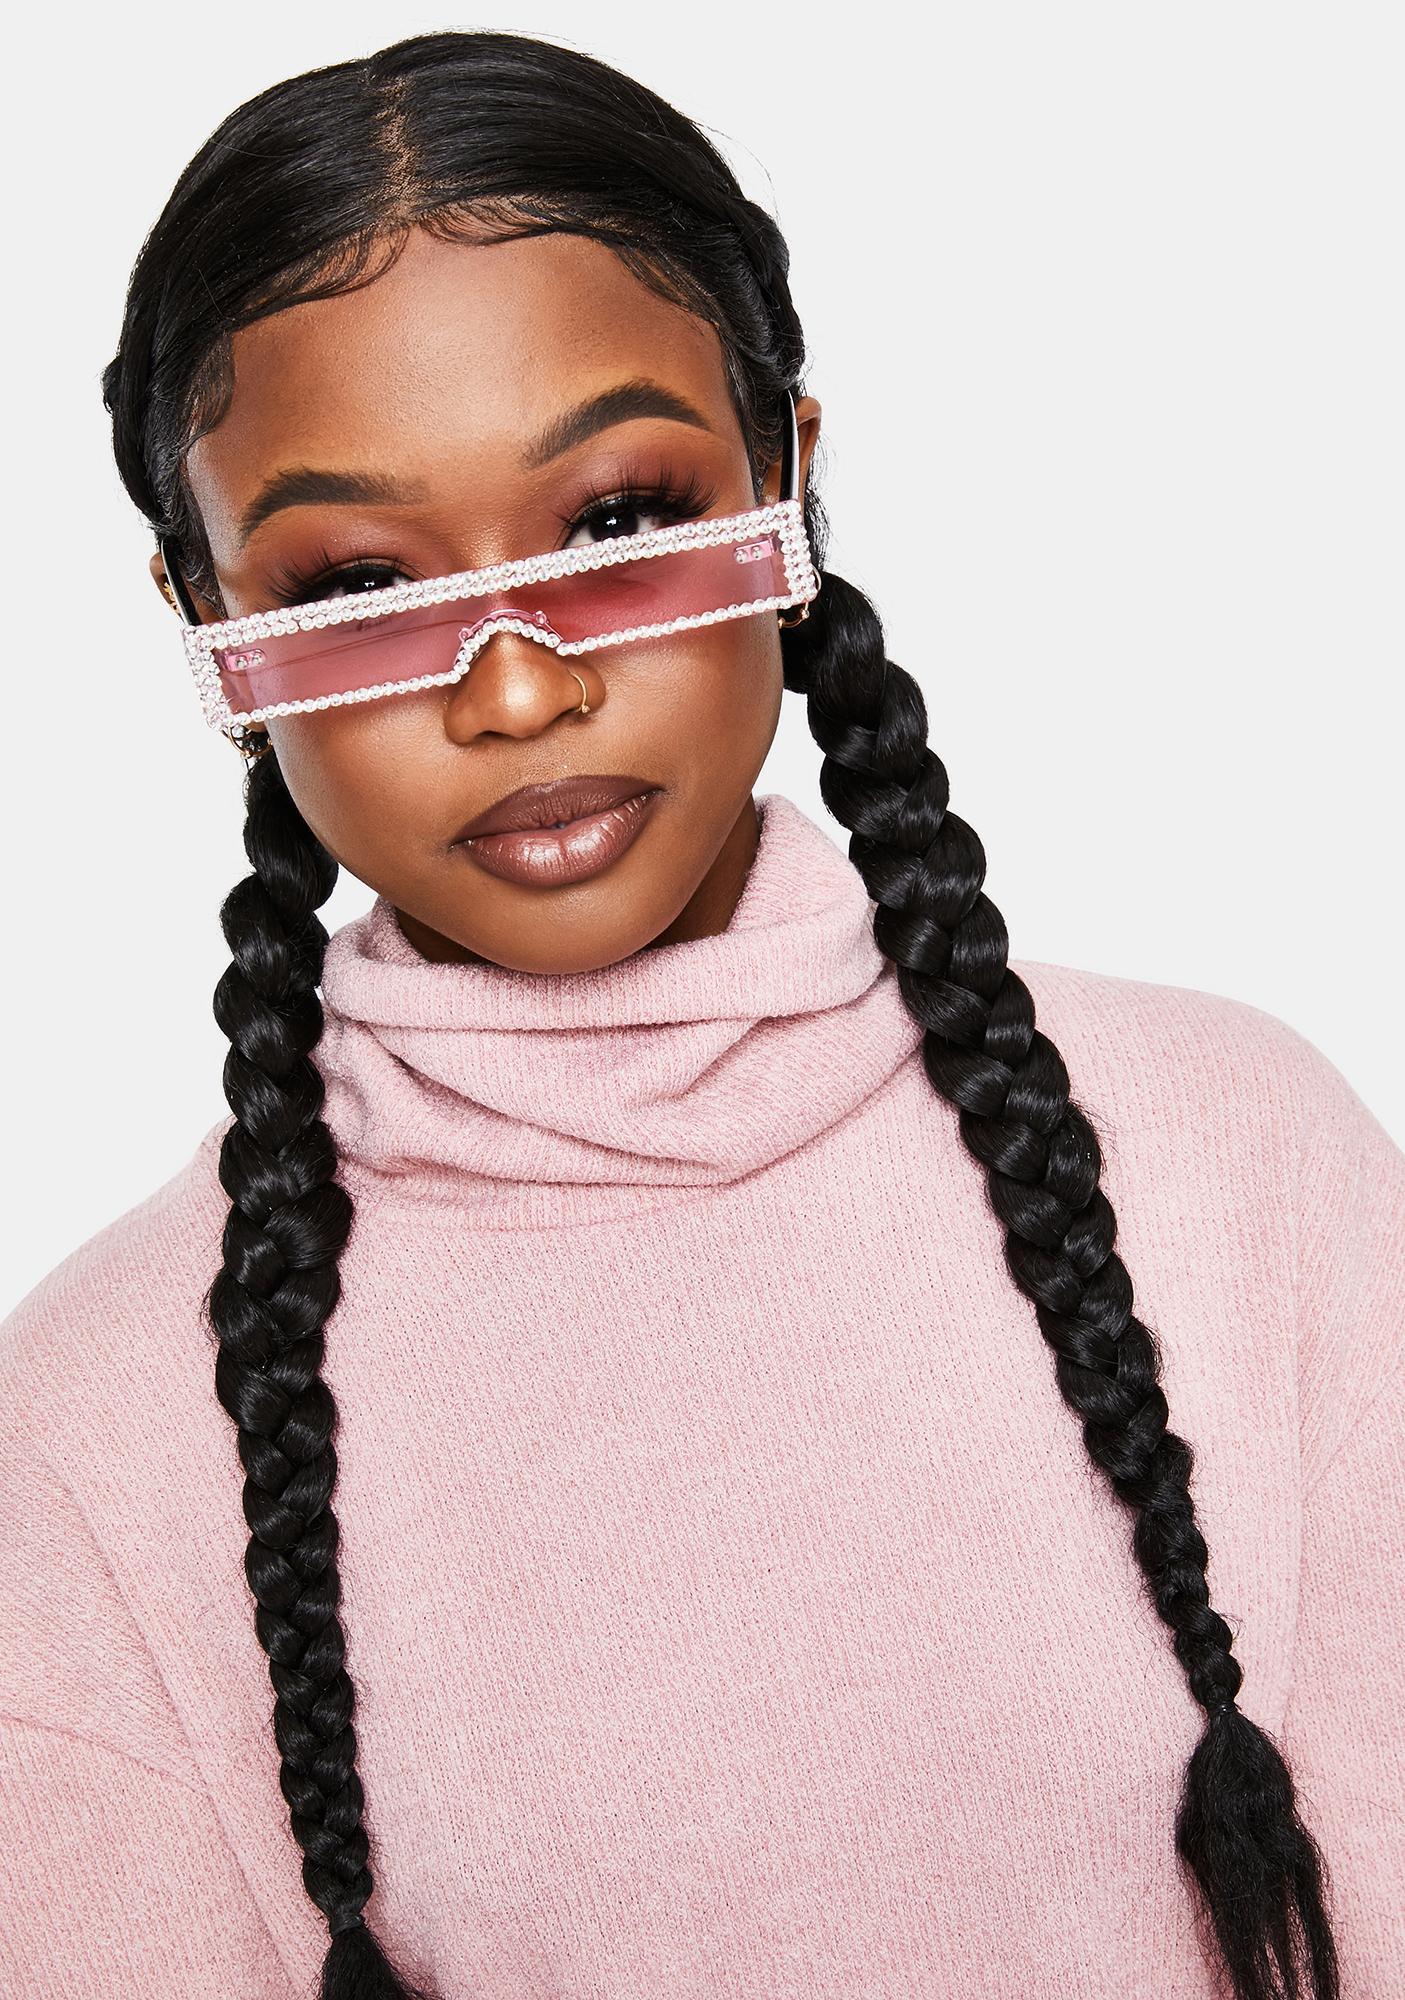 Pixie Into The Future Slim Rhinestone Sunglasses